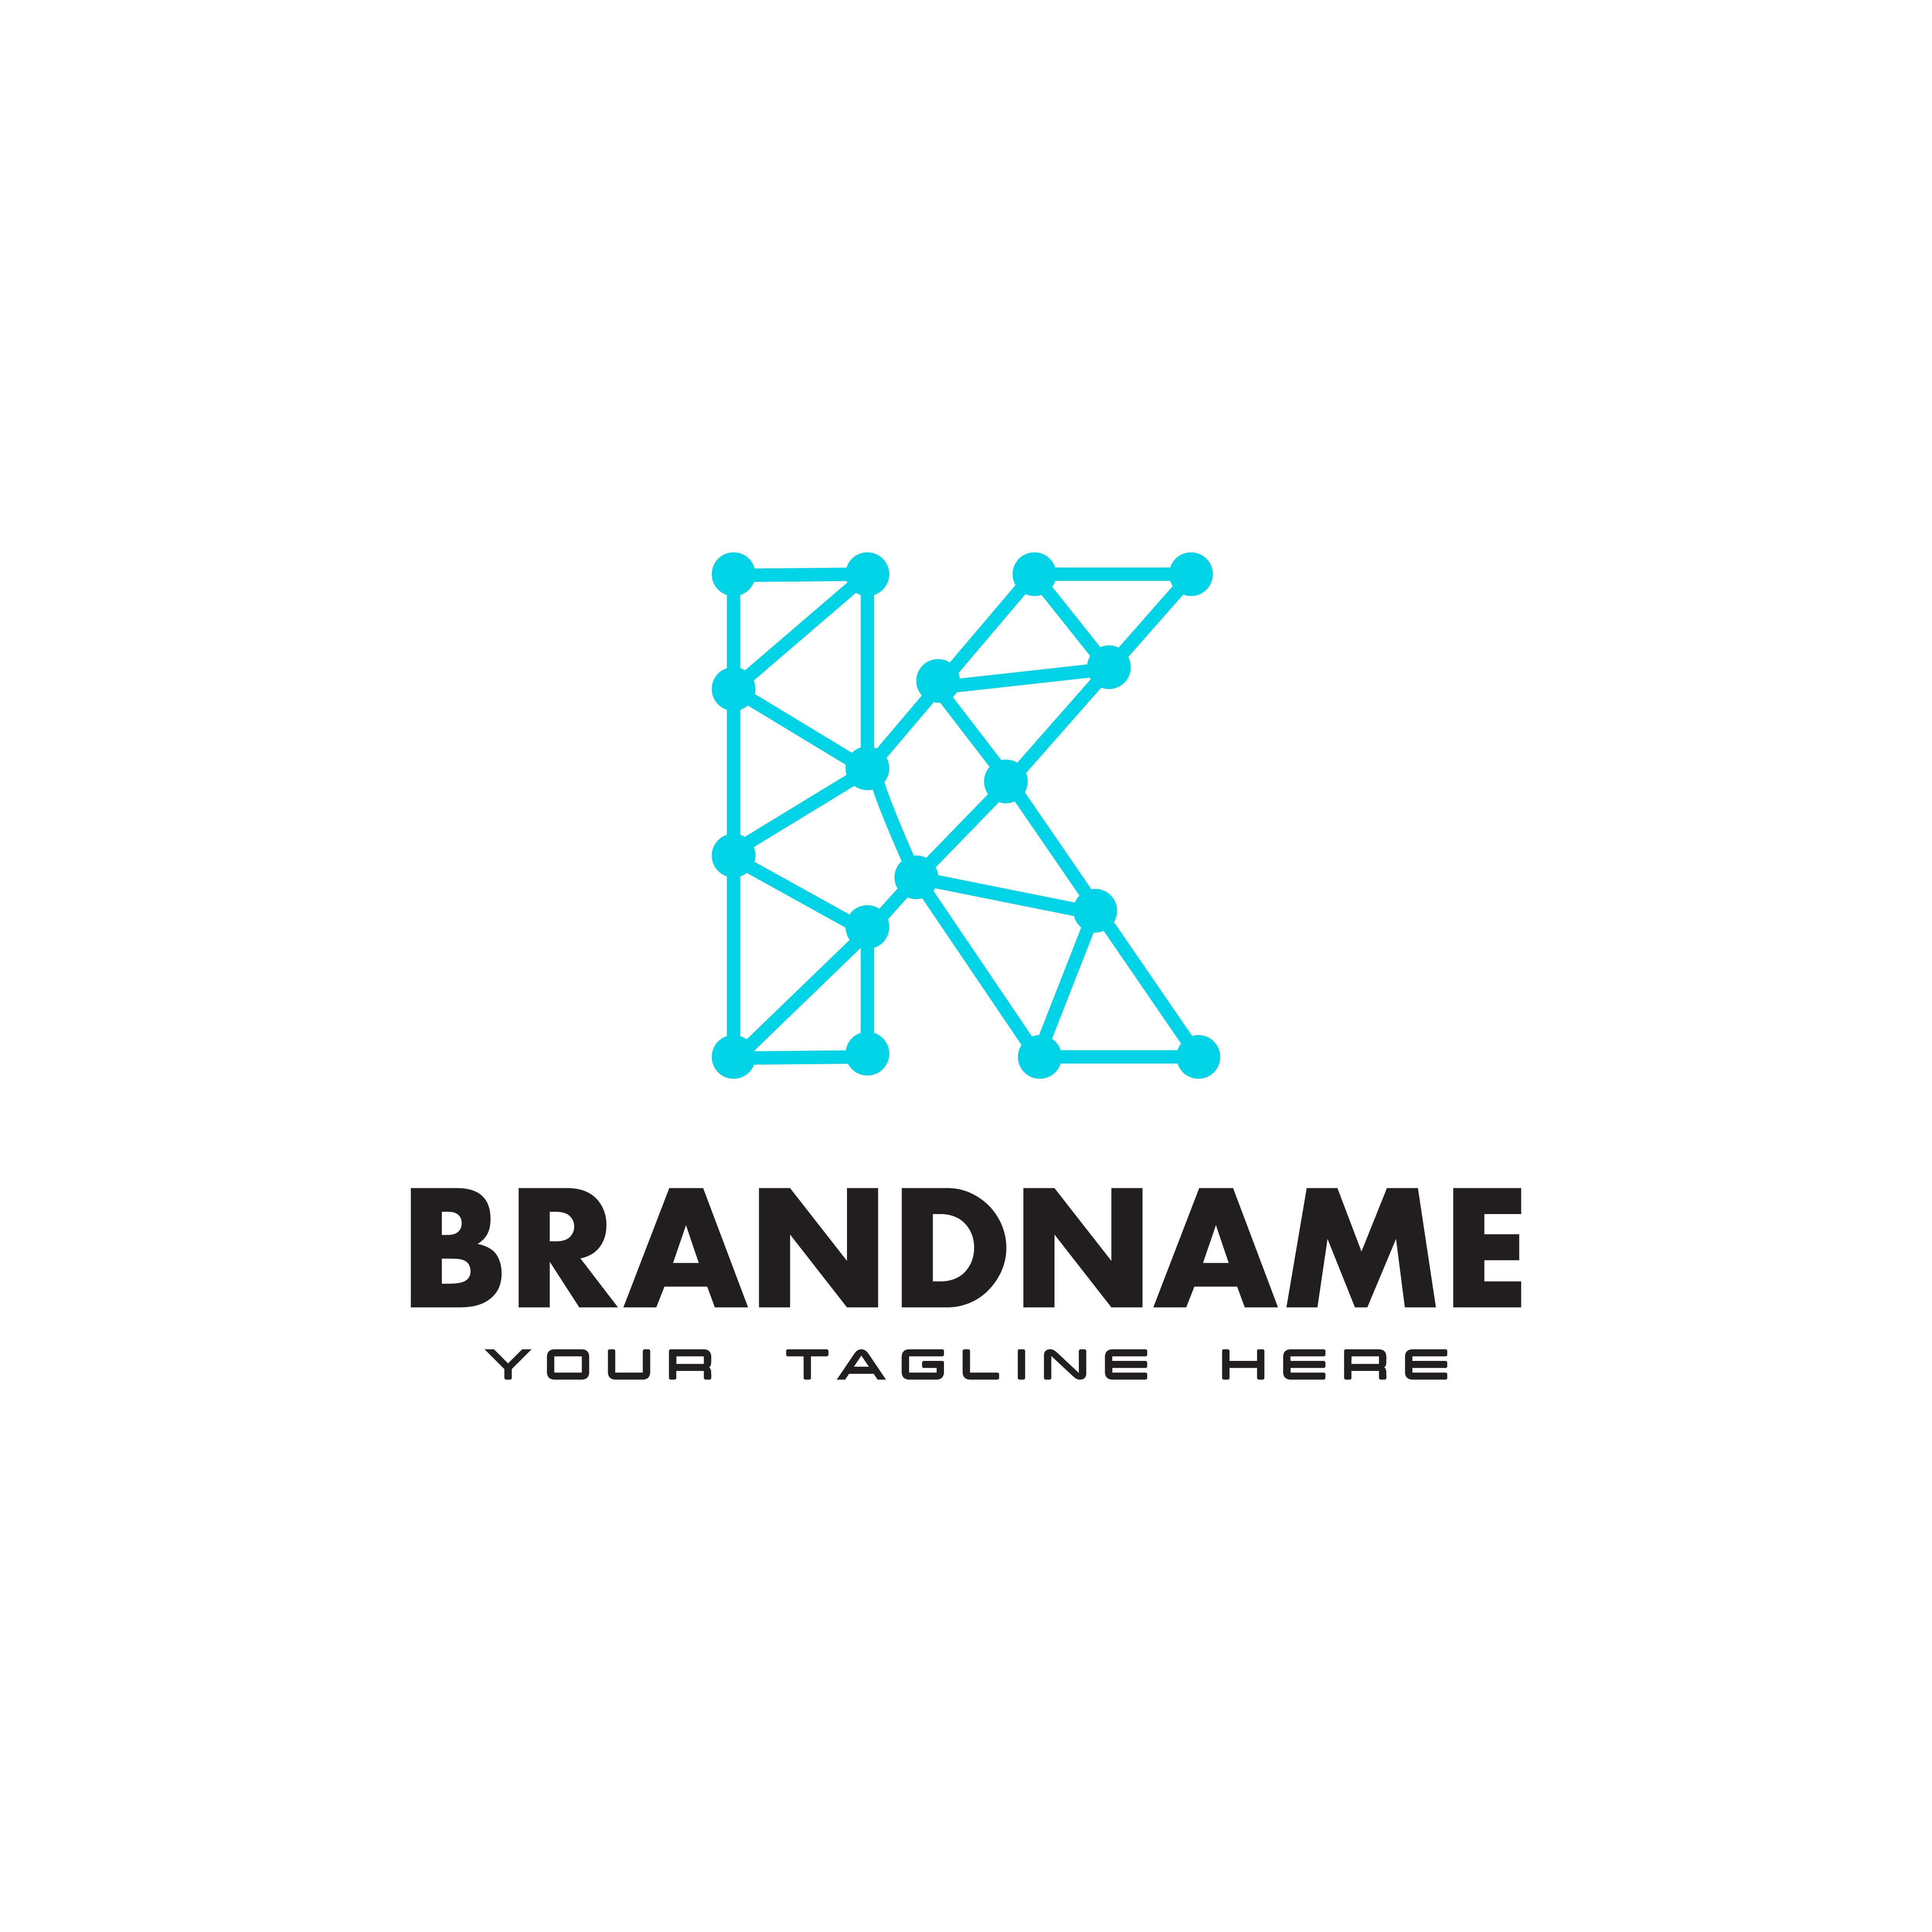 Letter K Dot Network Connection Logo Design Template